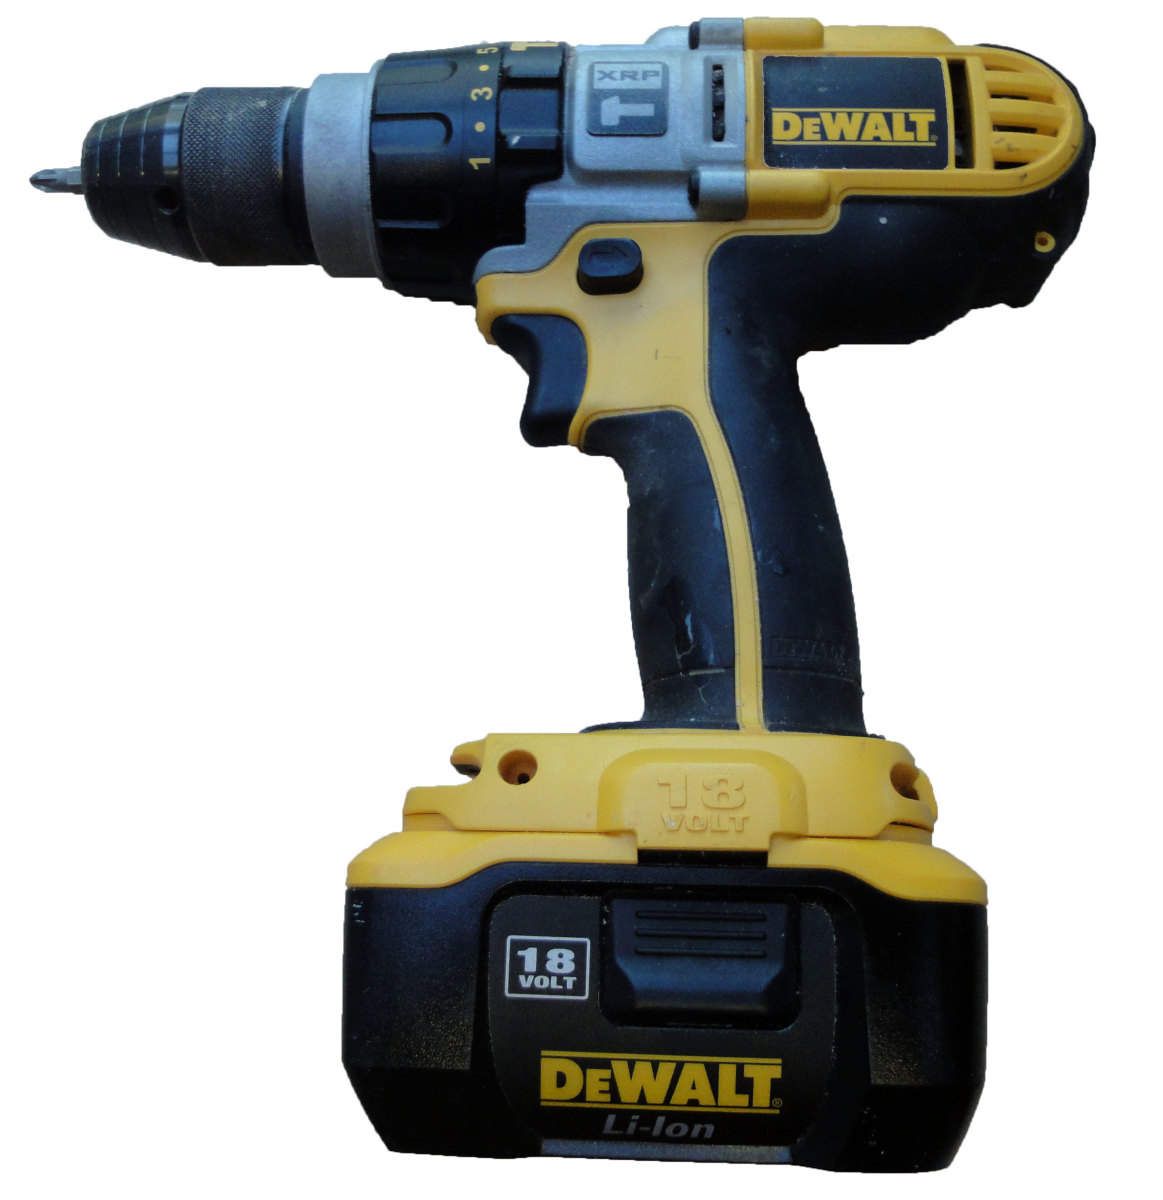 DeWalt cordless power drill